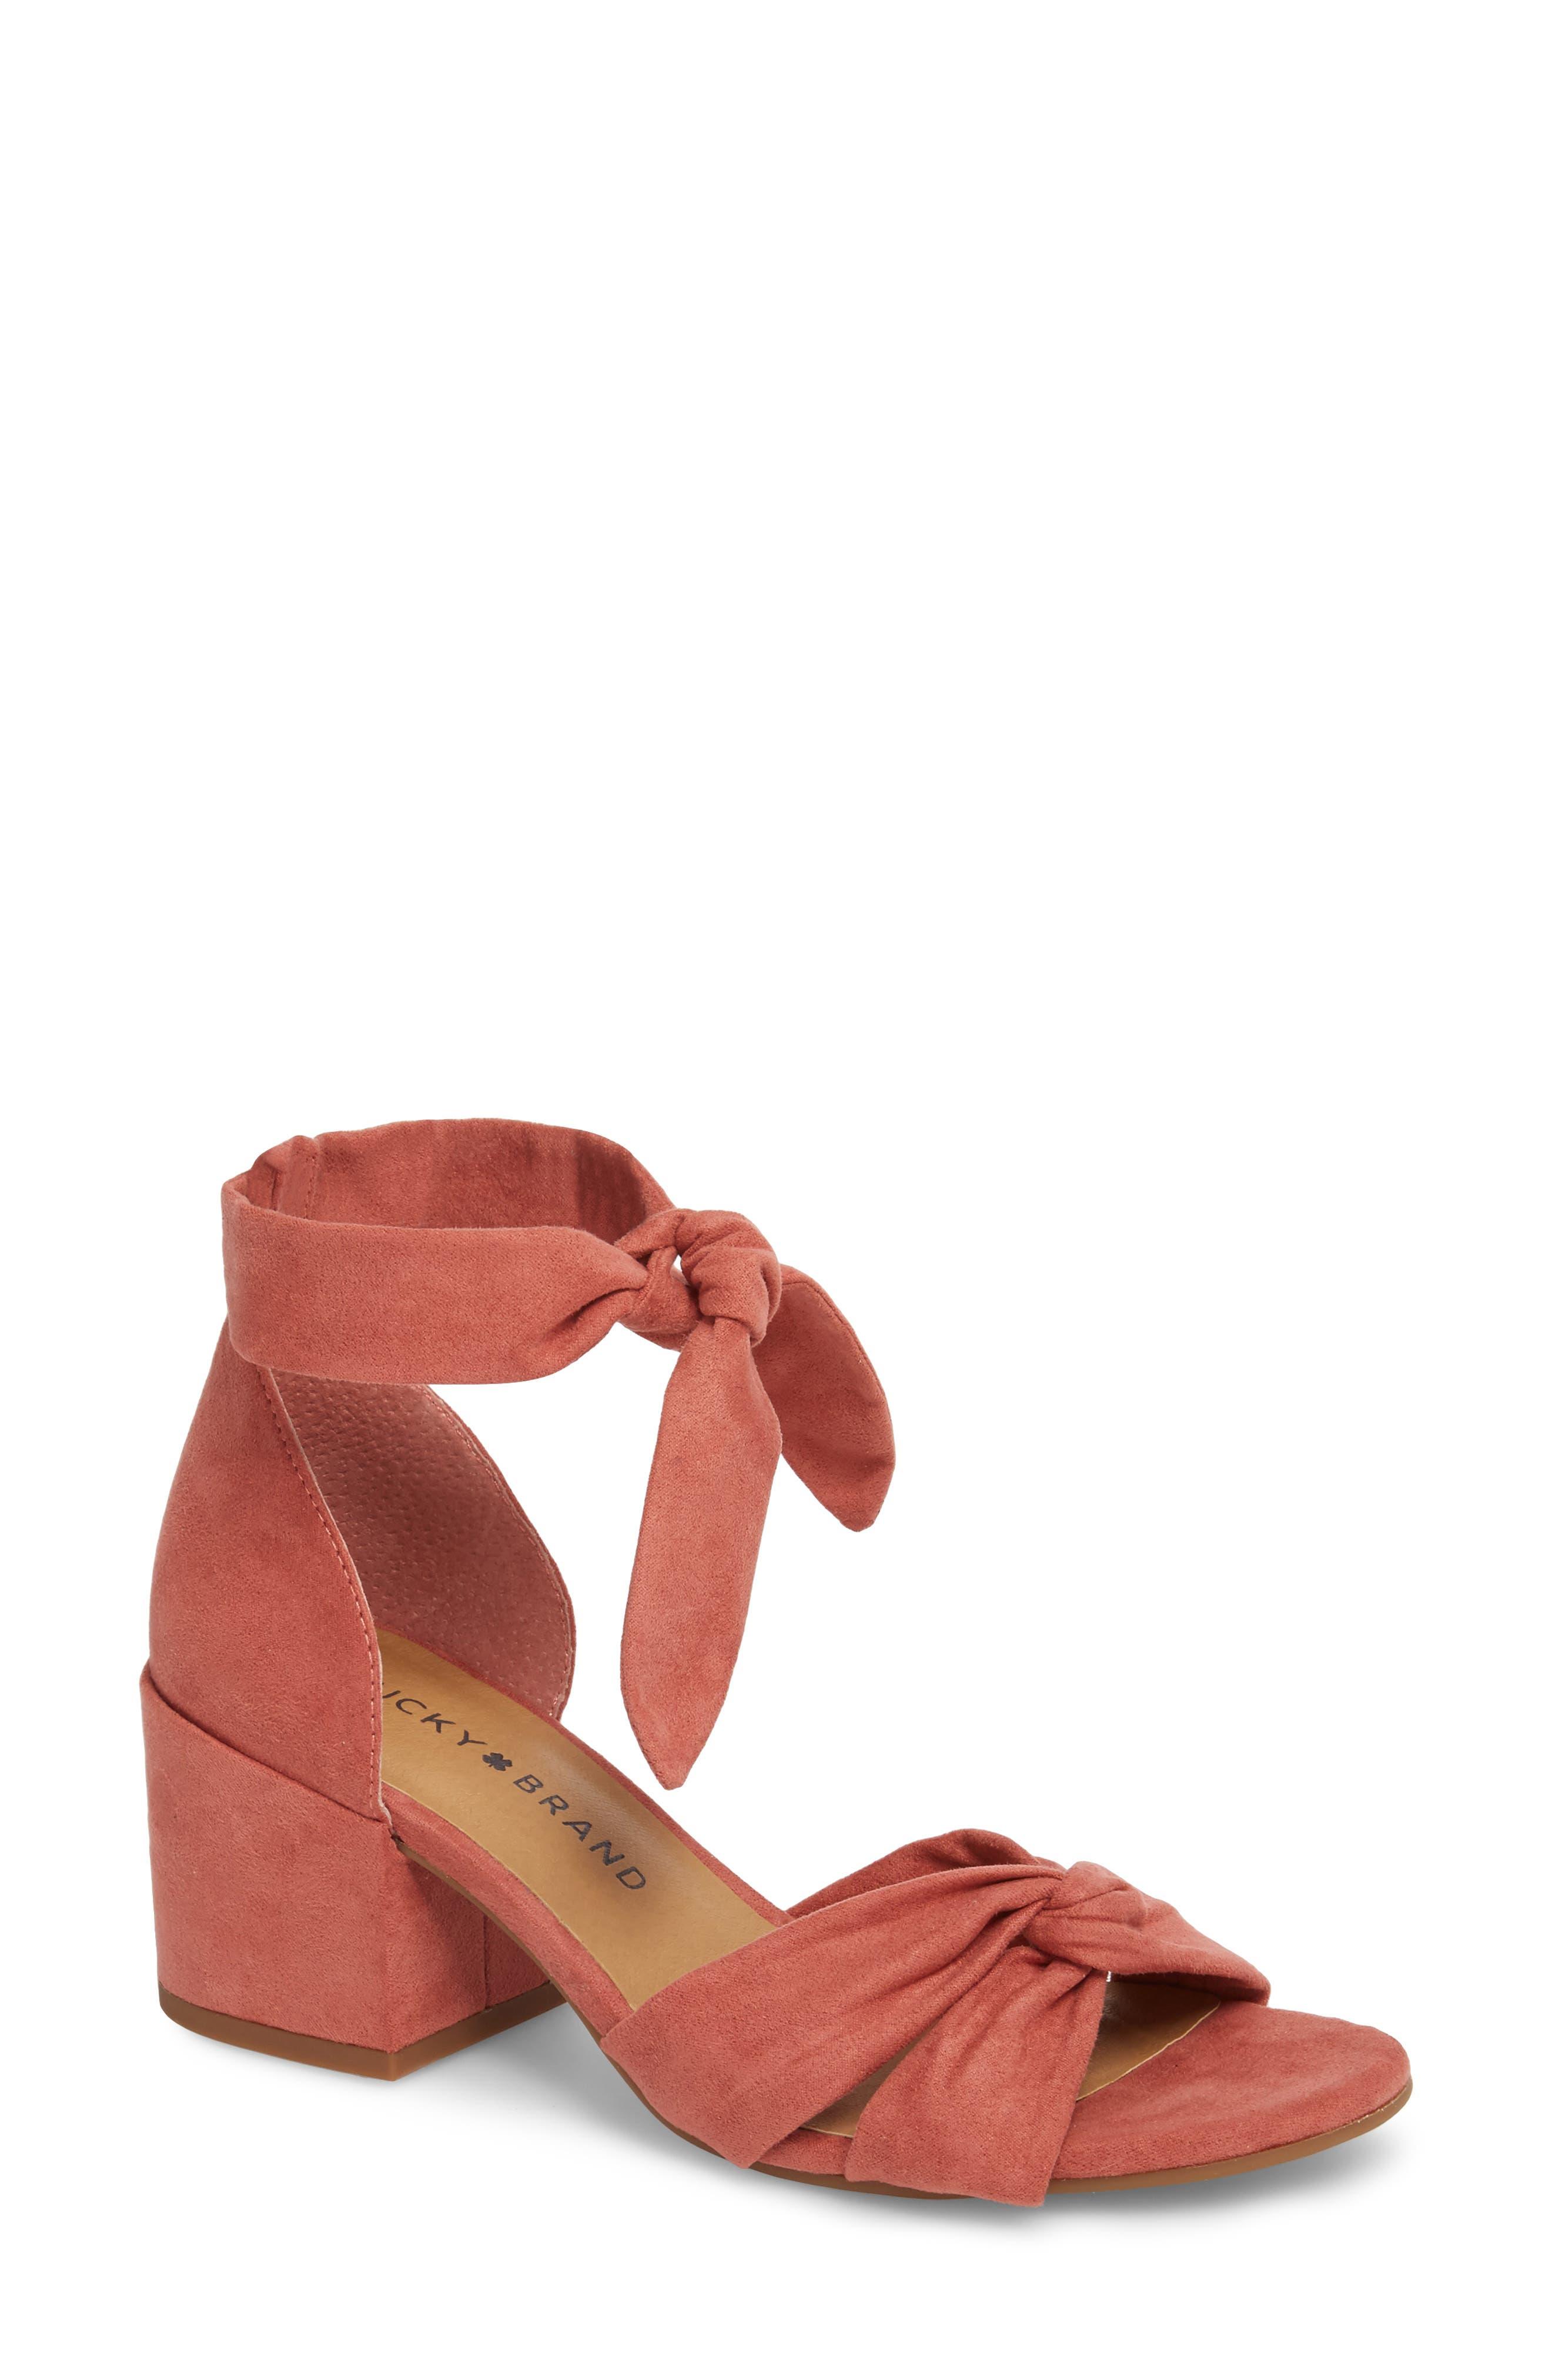 Xaylah Ankle Strap Sandal,                             Main thumbnail 7, color,